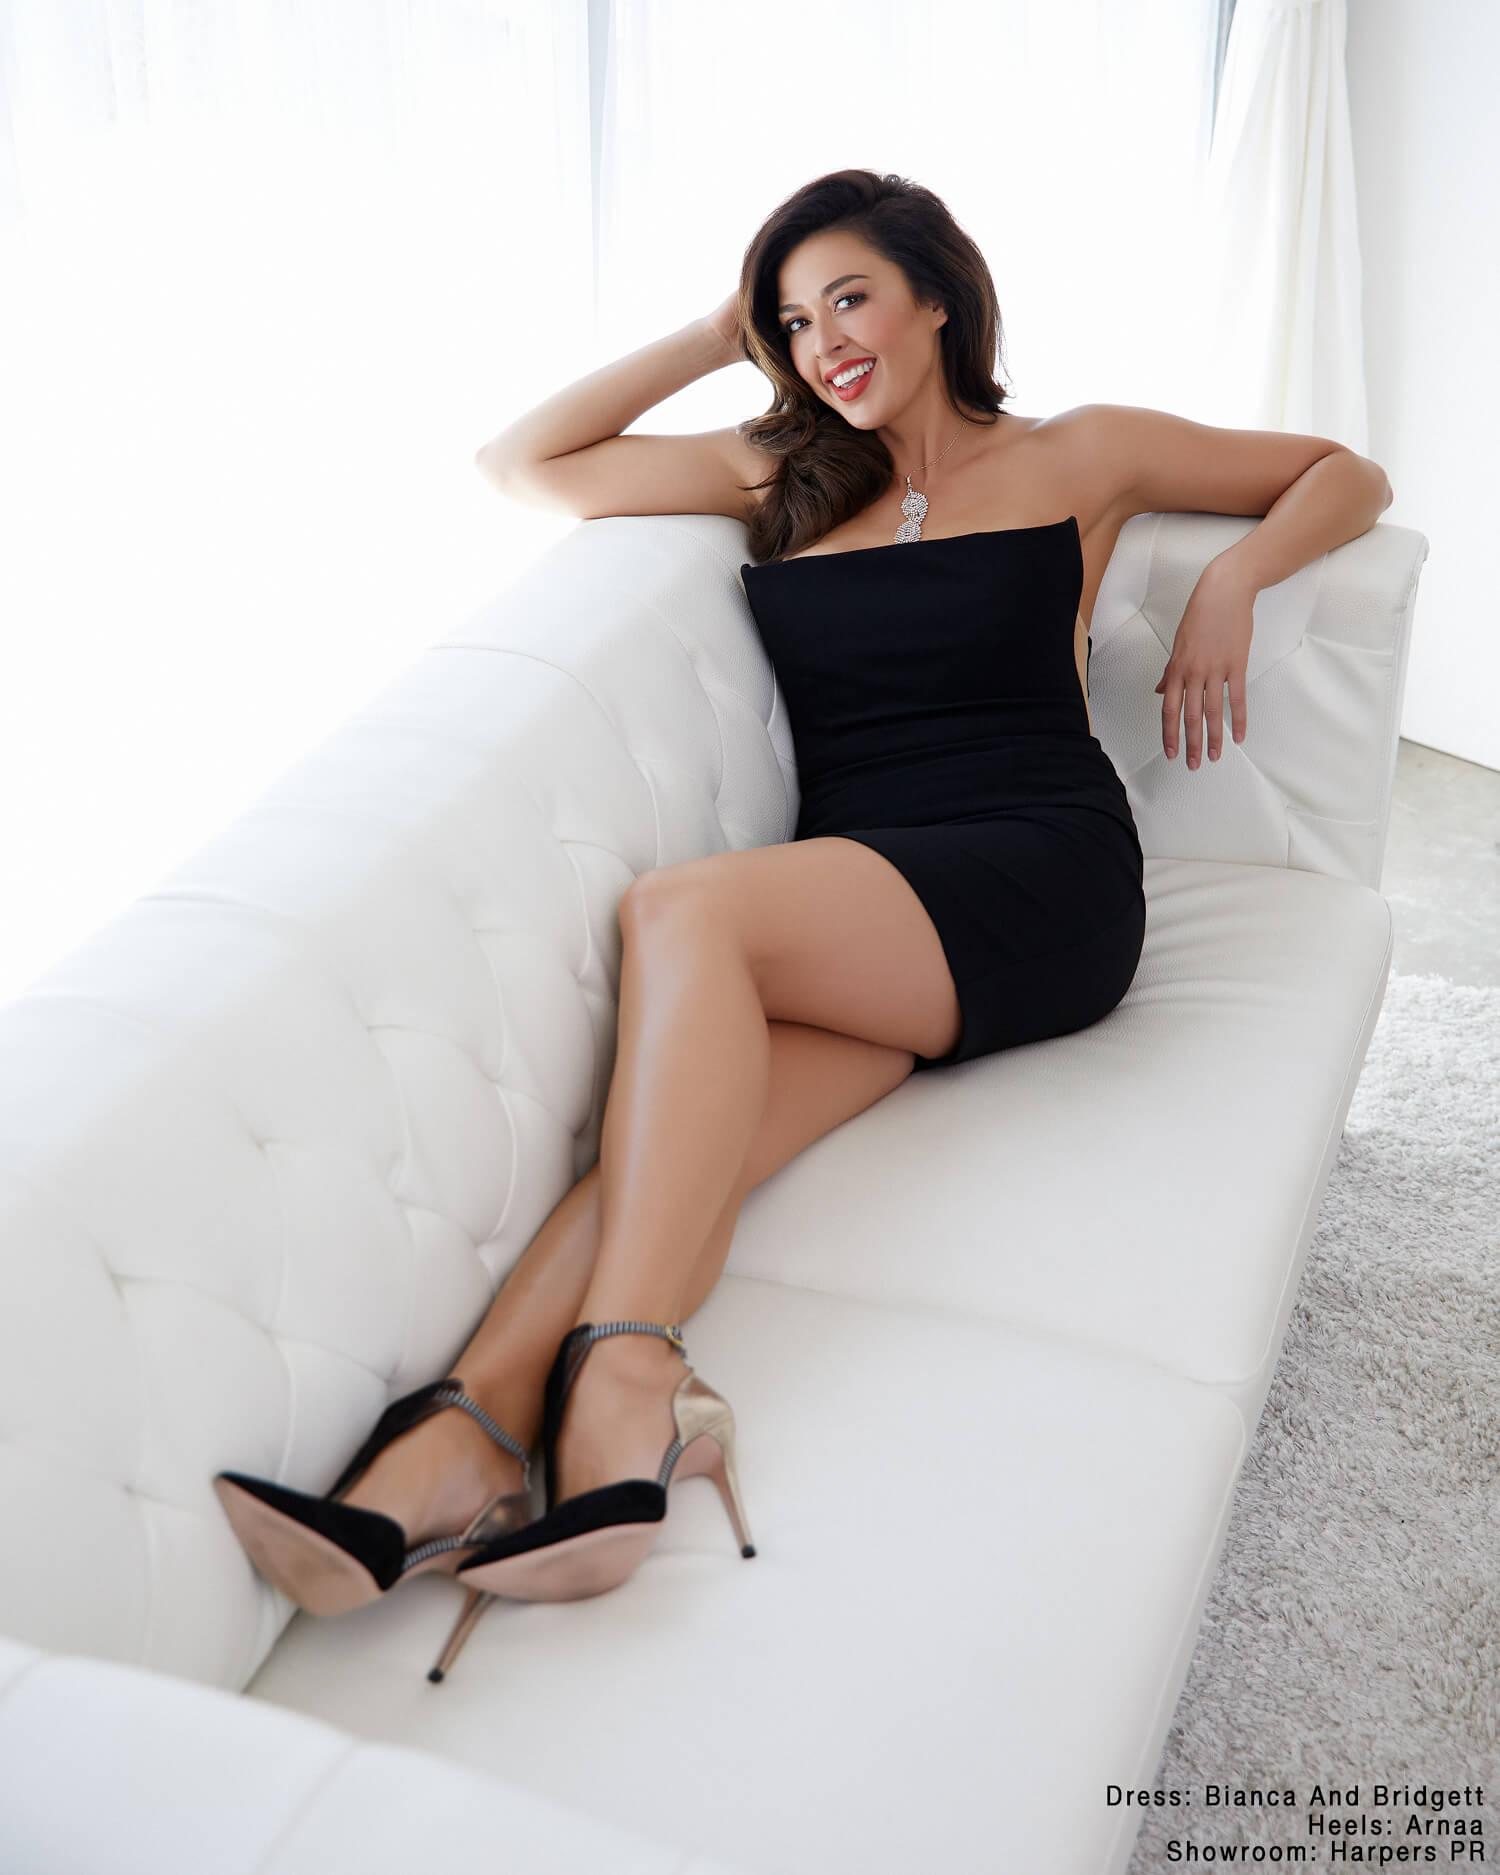 Aliyah OBrien